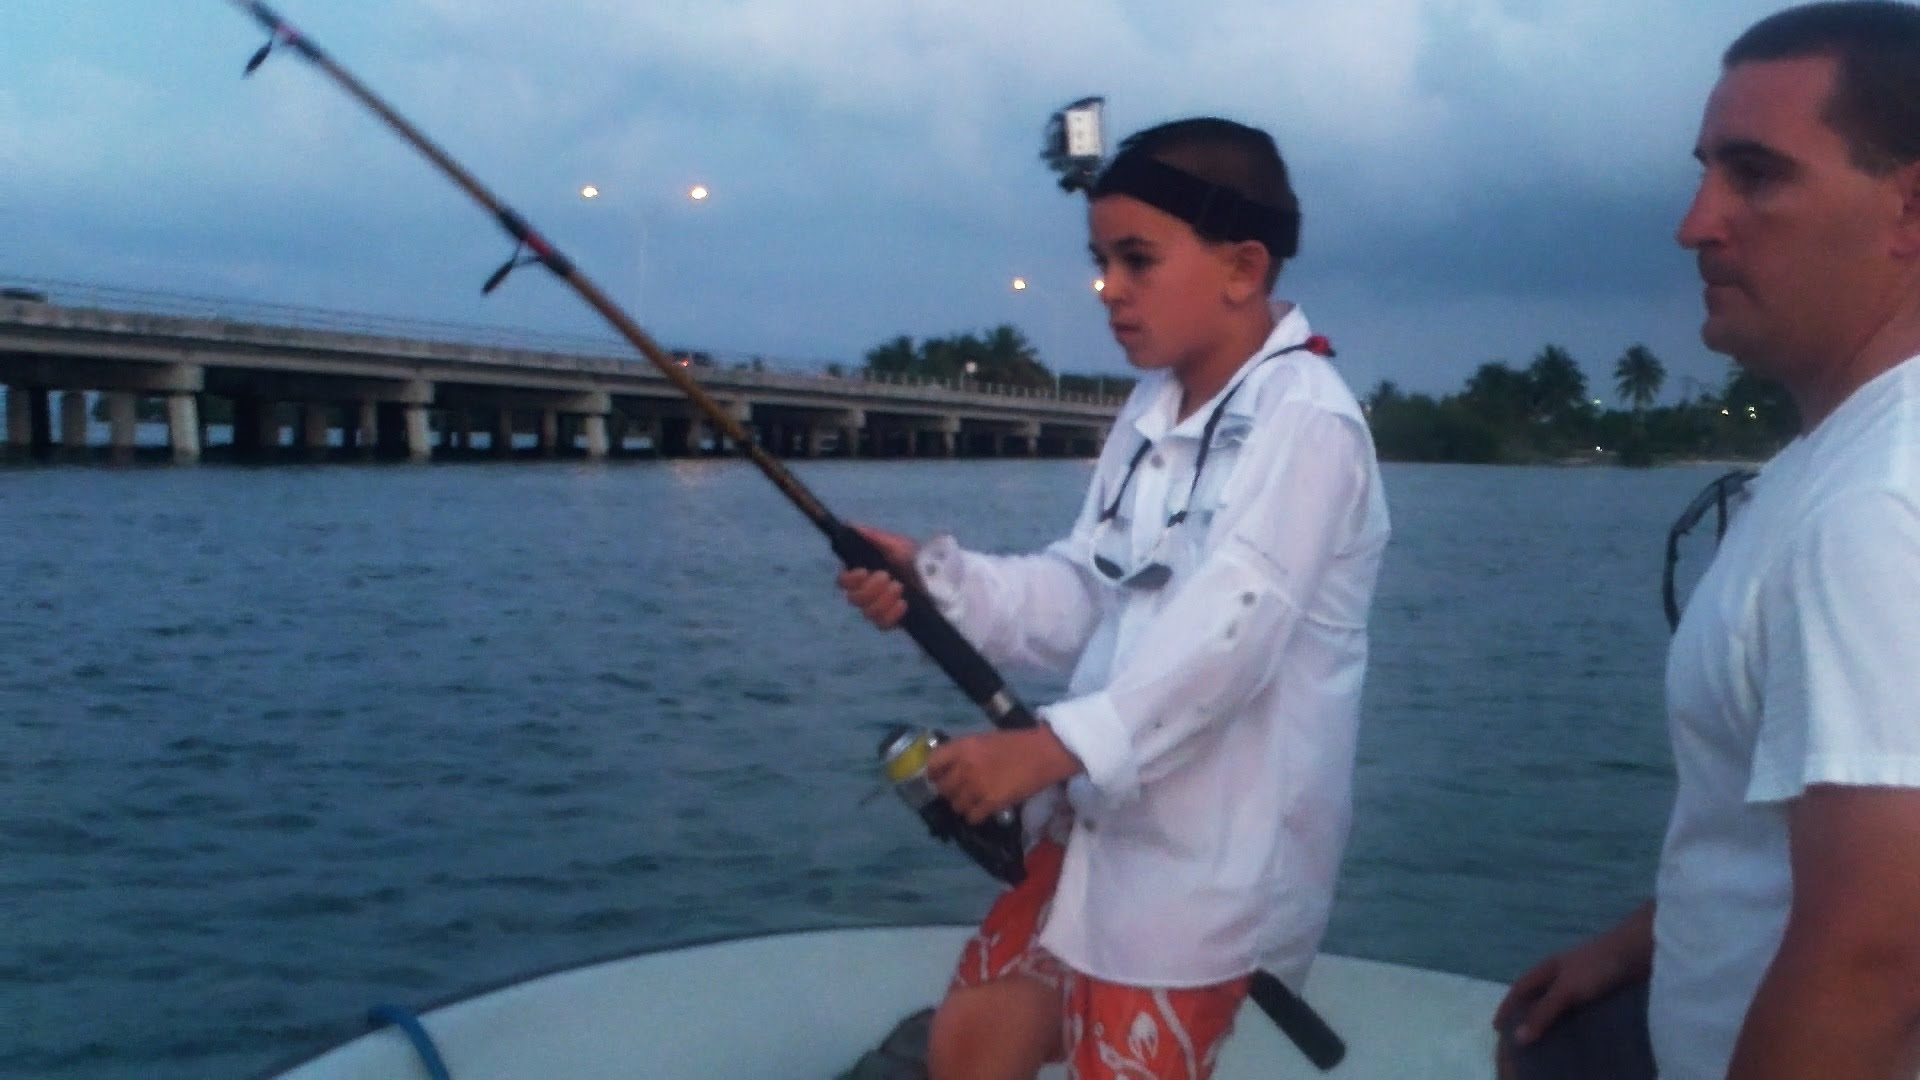 Miami Kid Catches Monster Fish